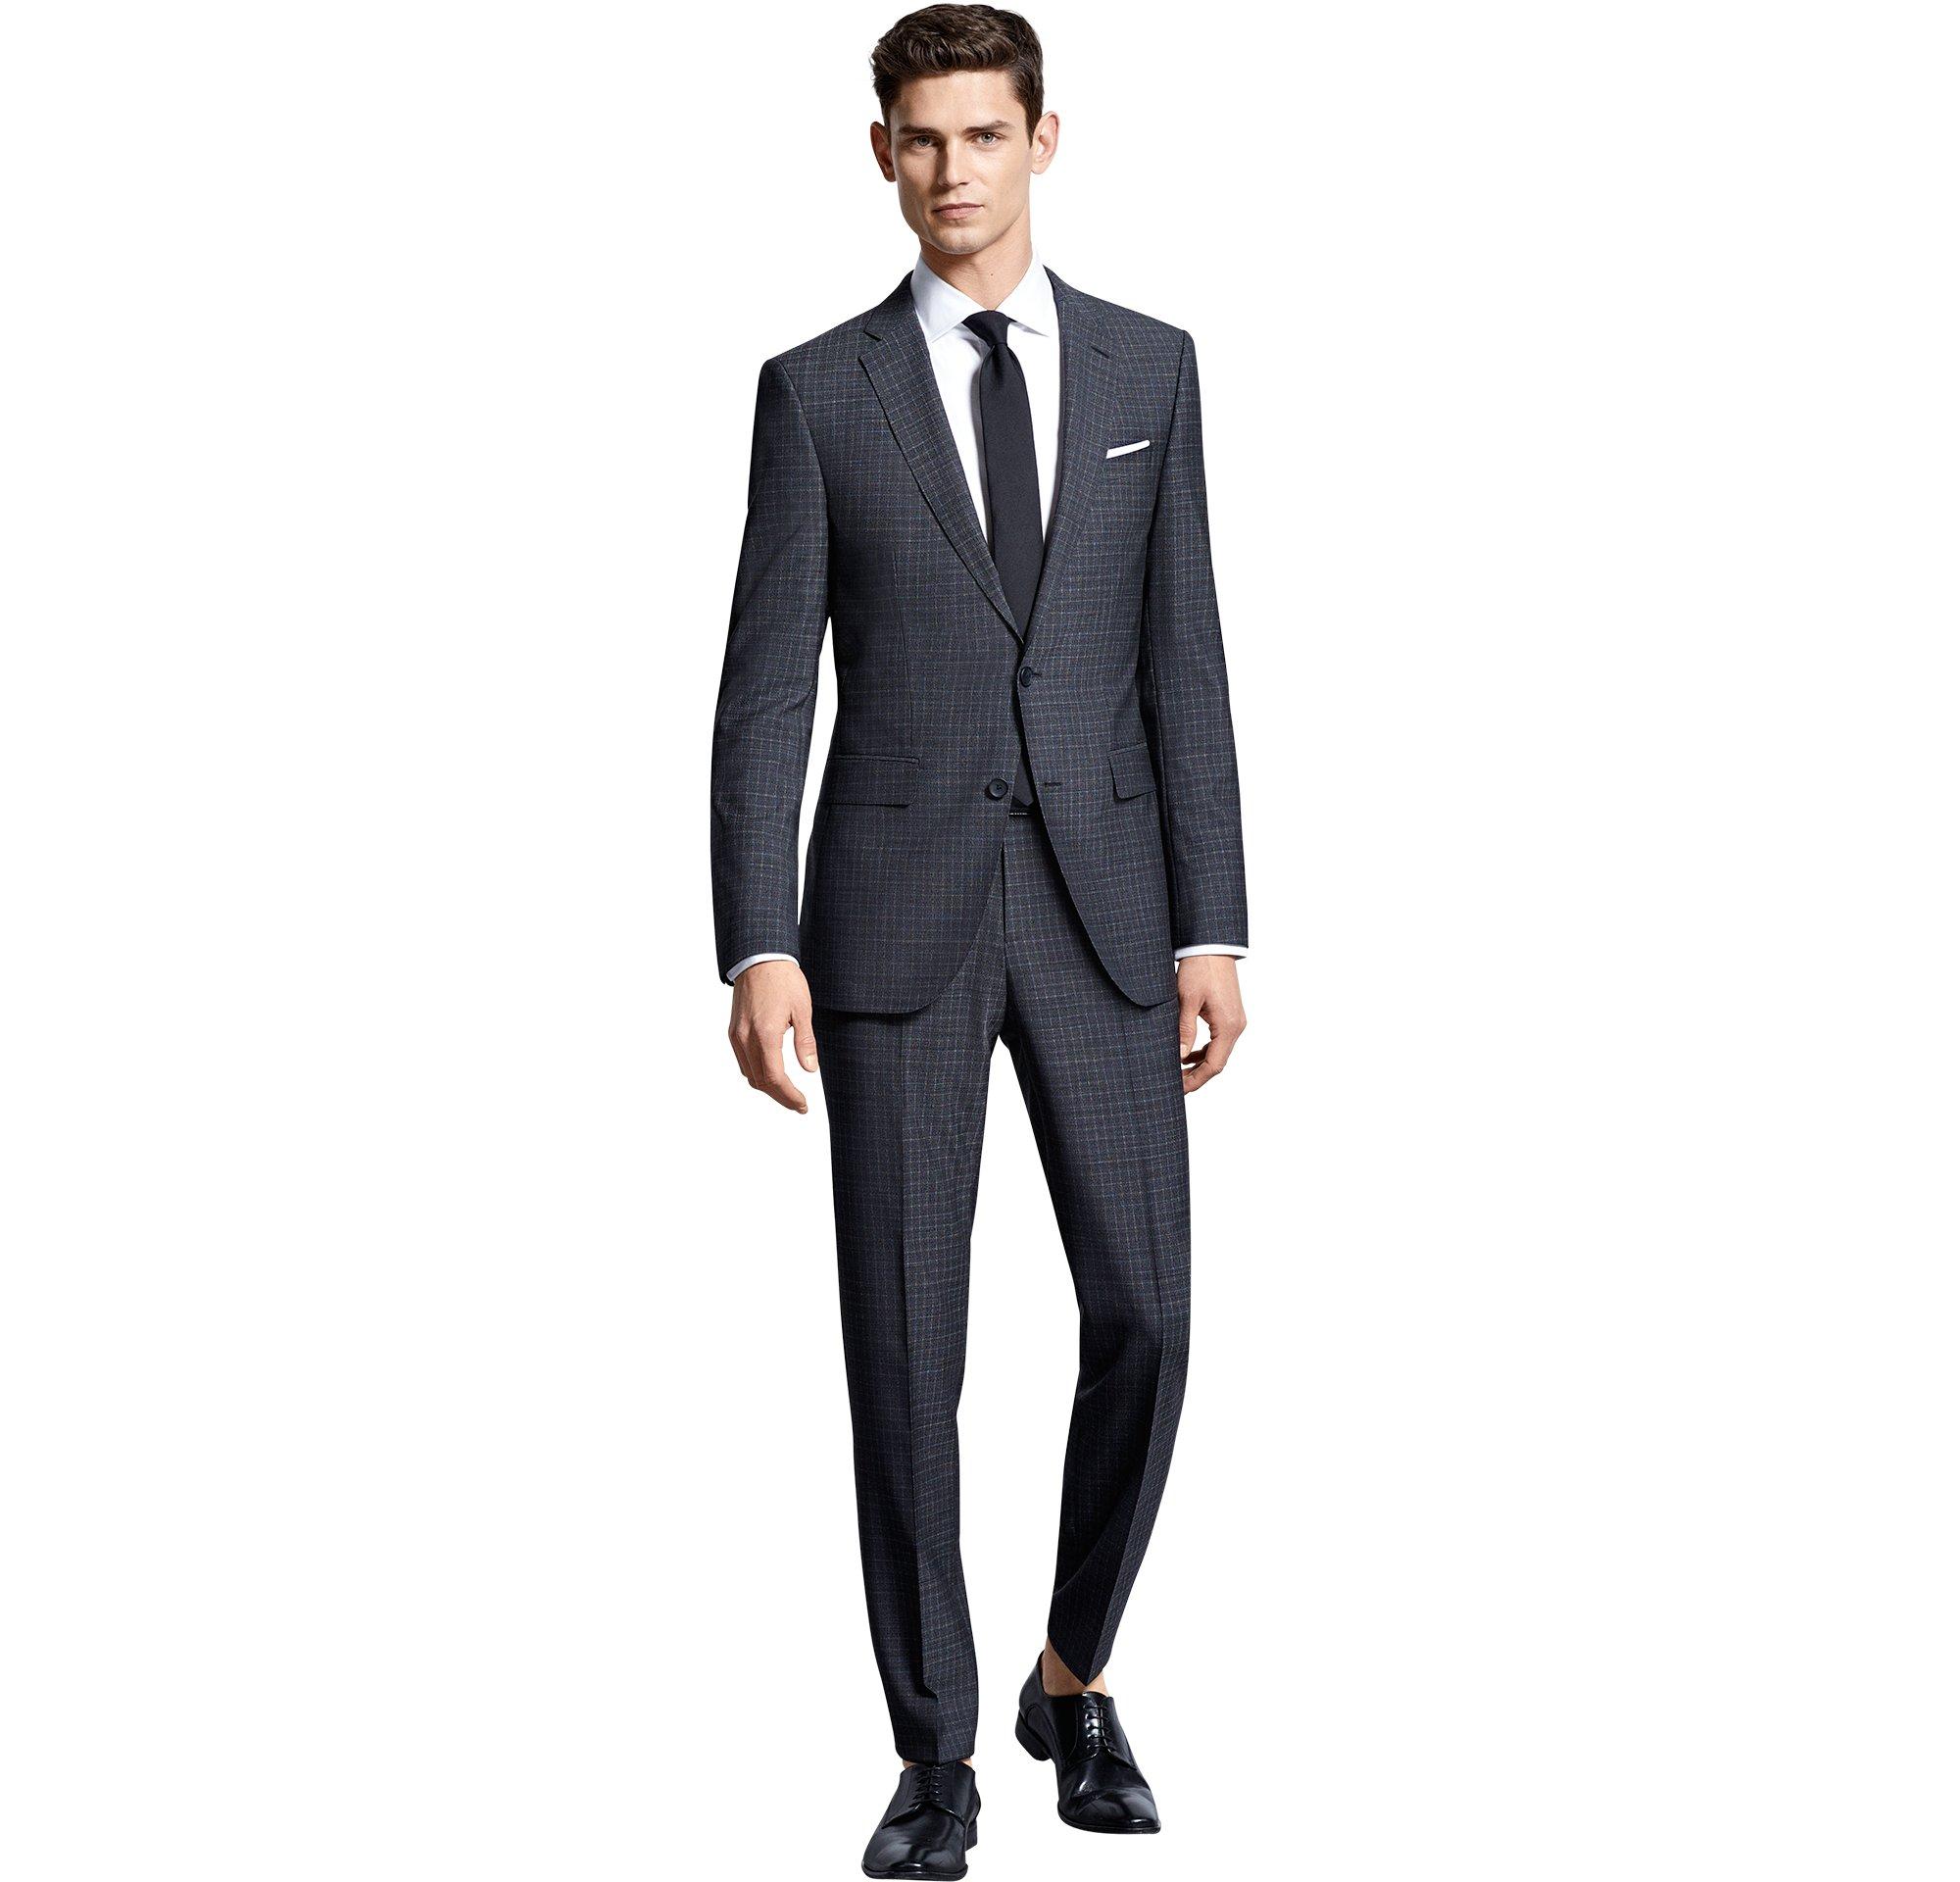 BOSS_Men_SR17SR_Suit499_Look_4,